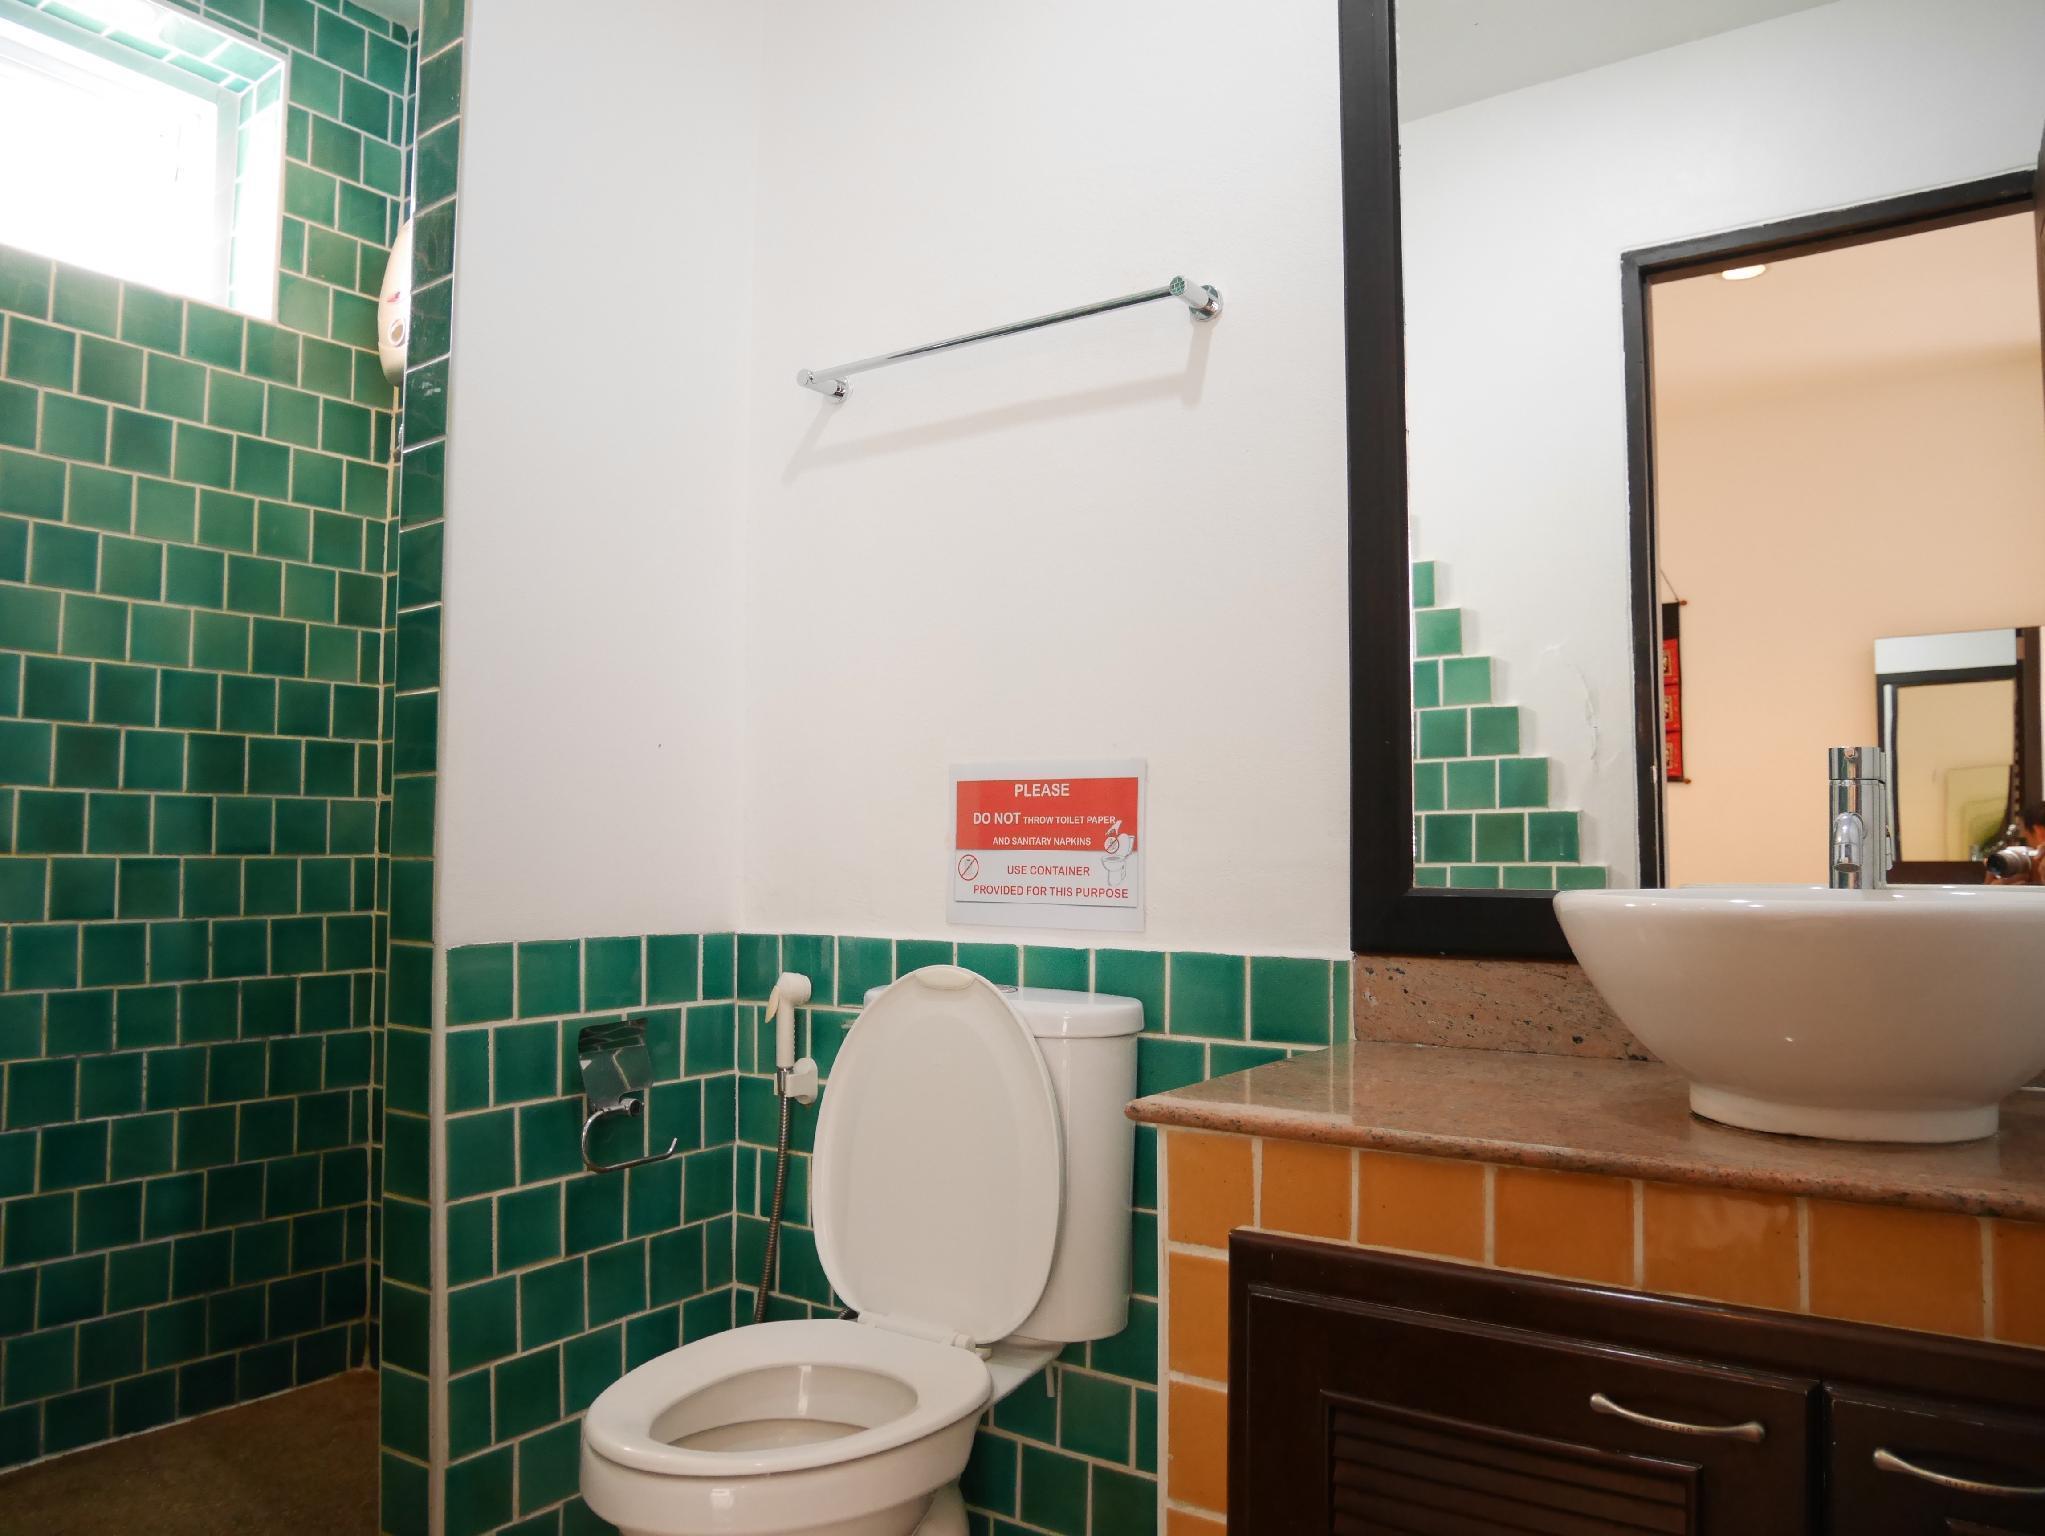 Studio Room, quiet easy lifestyle B23 (1 Floor) สตูดิโอ อพาร์ตเมนต์ 1 ห้องน้ำส่วนตัว ขนาด 25 ตร.ม. – หาดละไม